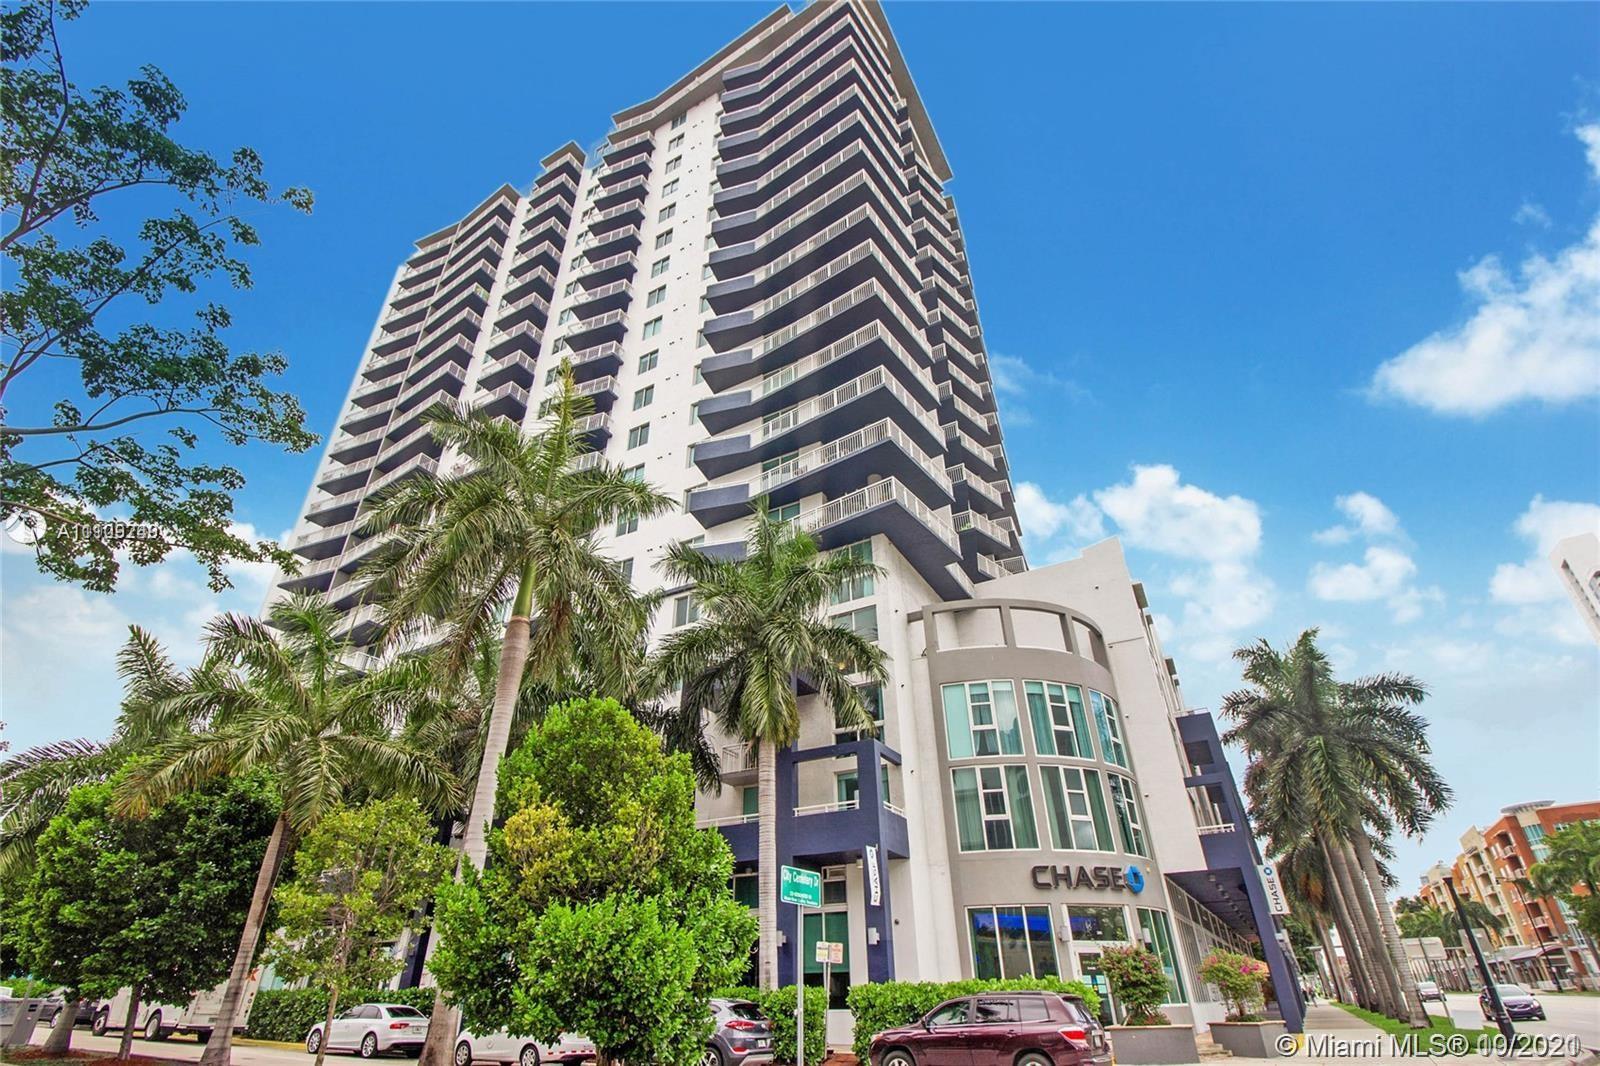 1800 Biscayne Plaza #708 - 275 NE 18th St #708, Miami, FL 33132